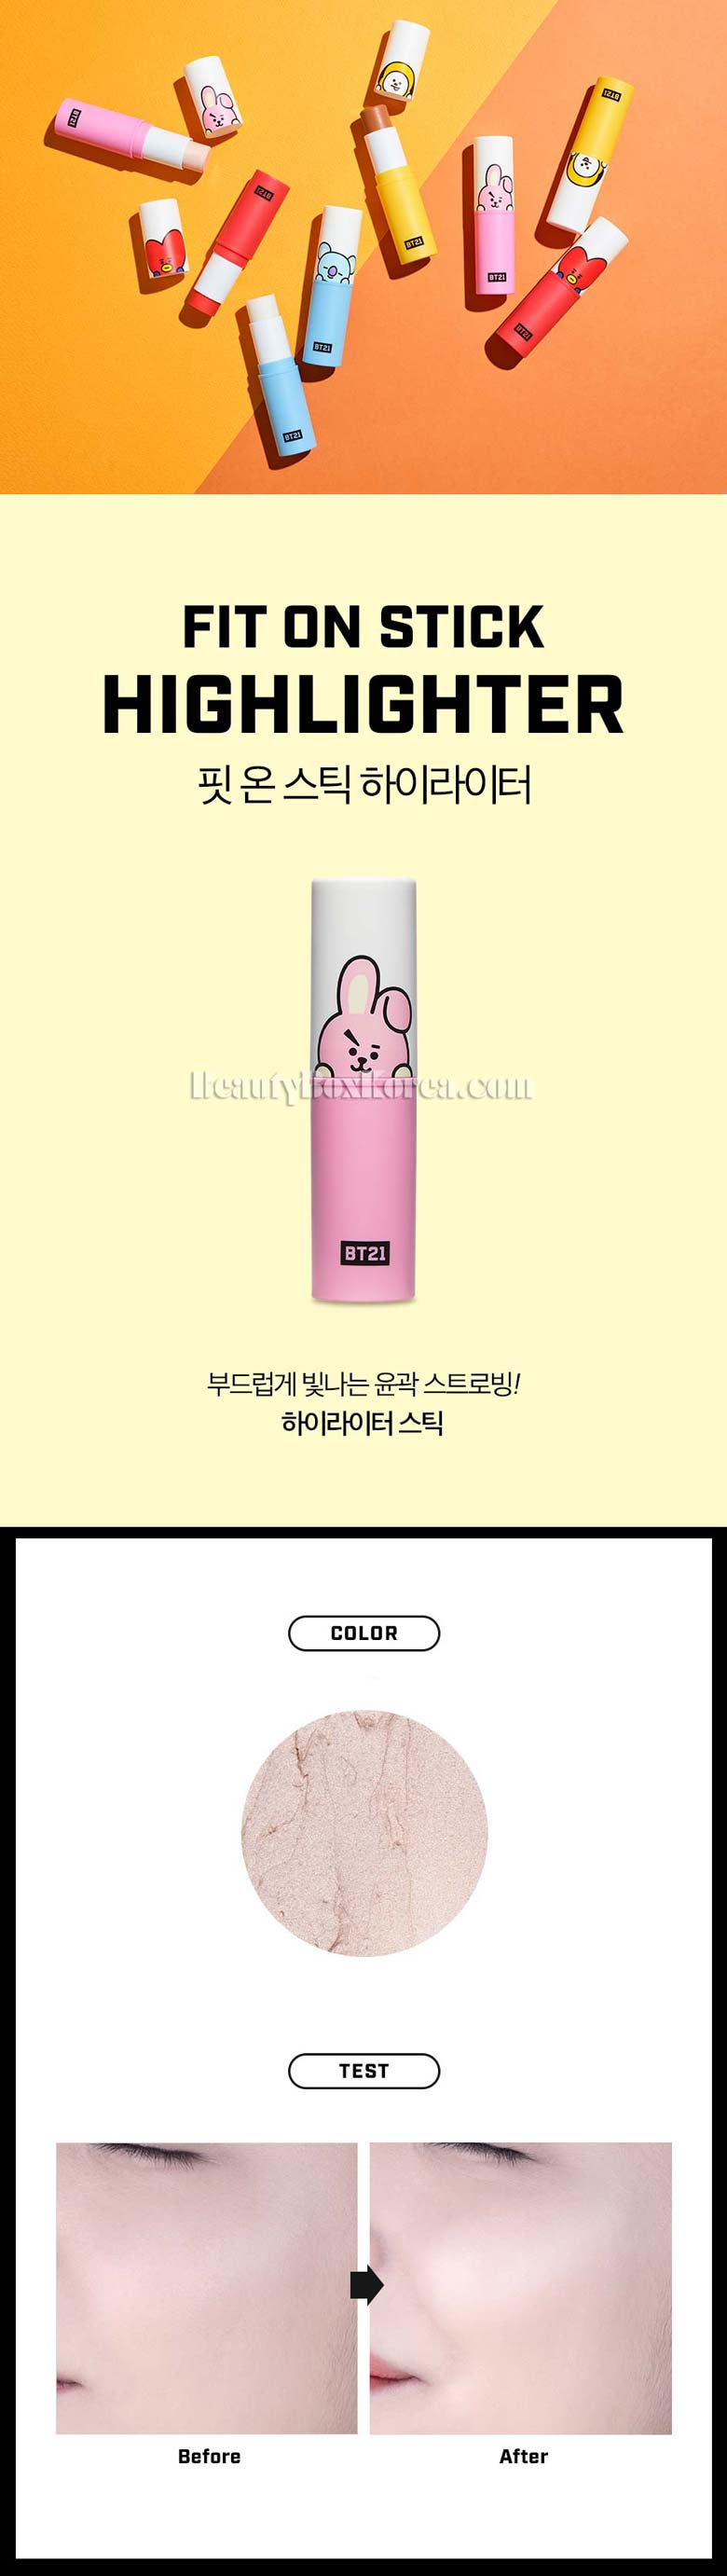 Beauty Box Korea - VT COSMETICS BT21 Fit On Stick 9 5g[VTxBT21